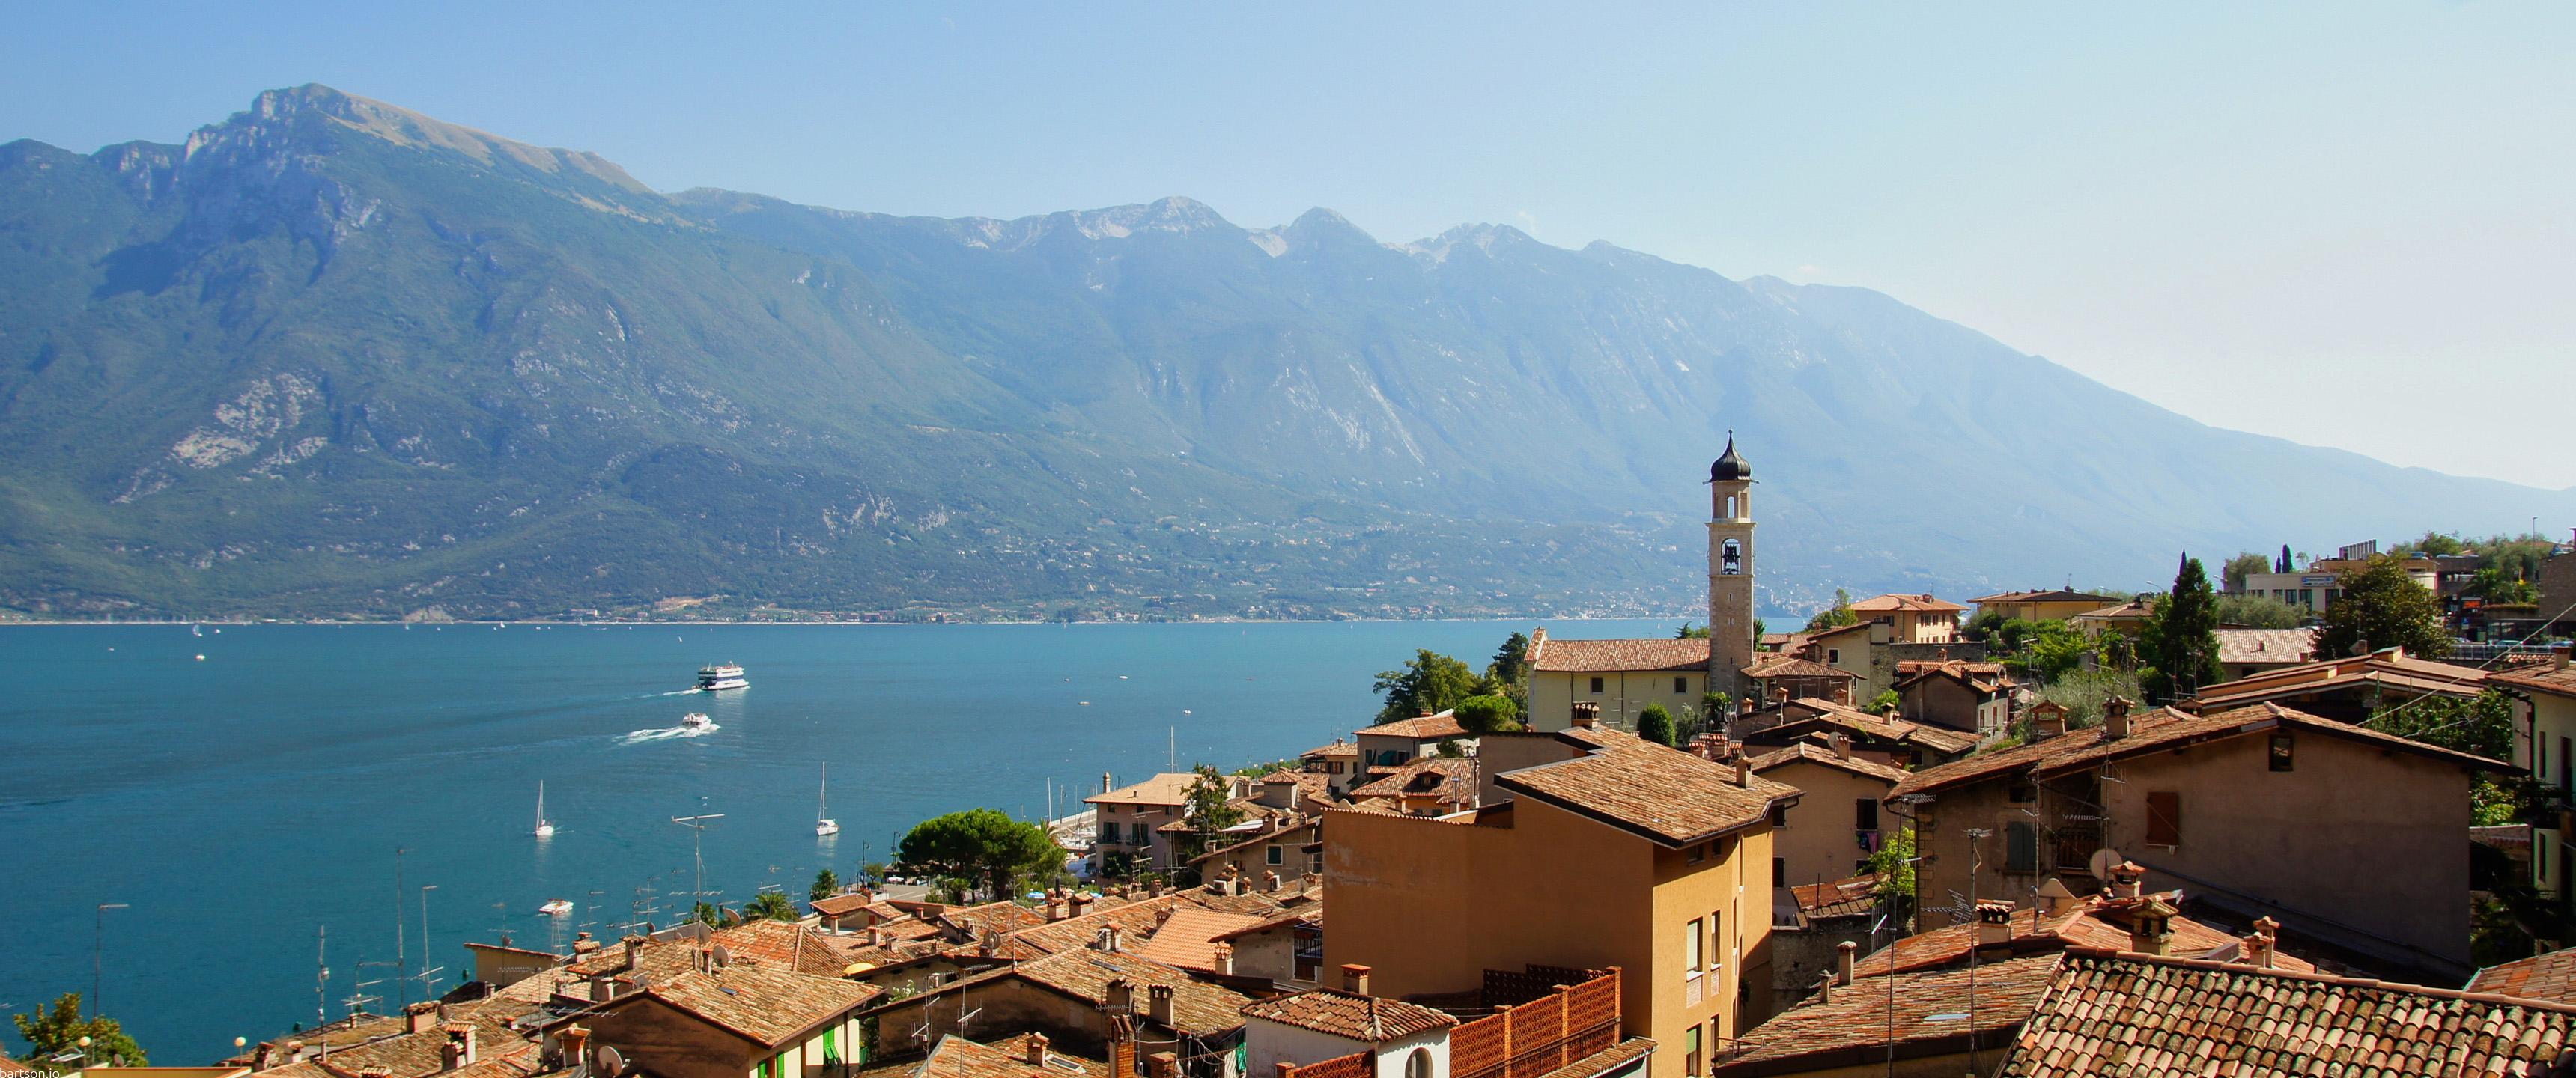 Lago di Garda 219 Wallpaper fr Ultrawide Monitore 3440x1440